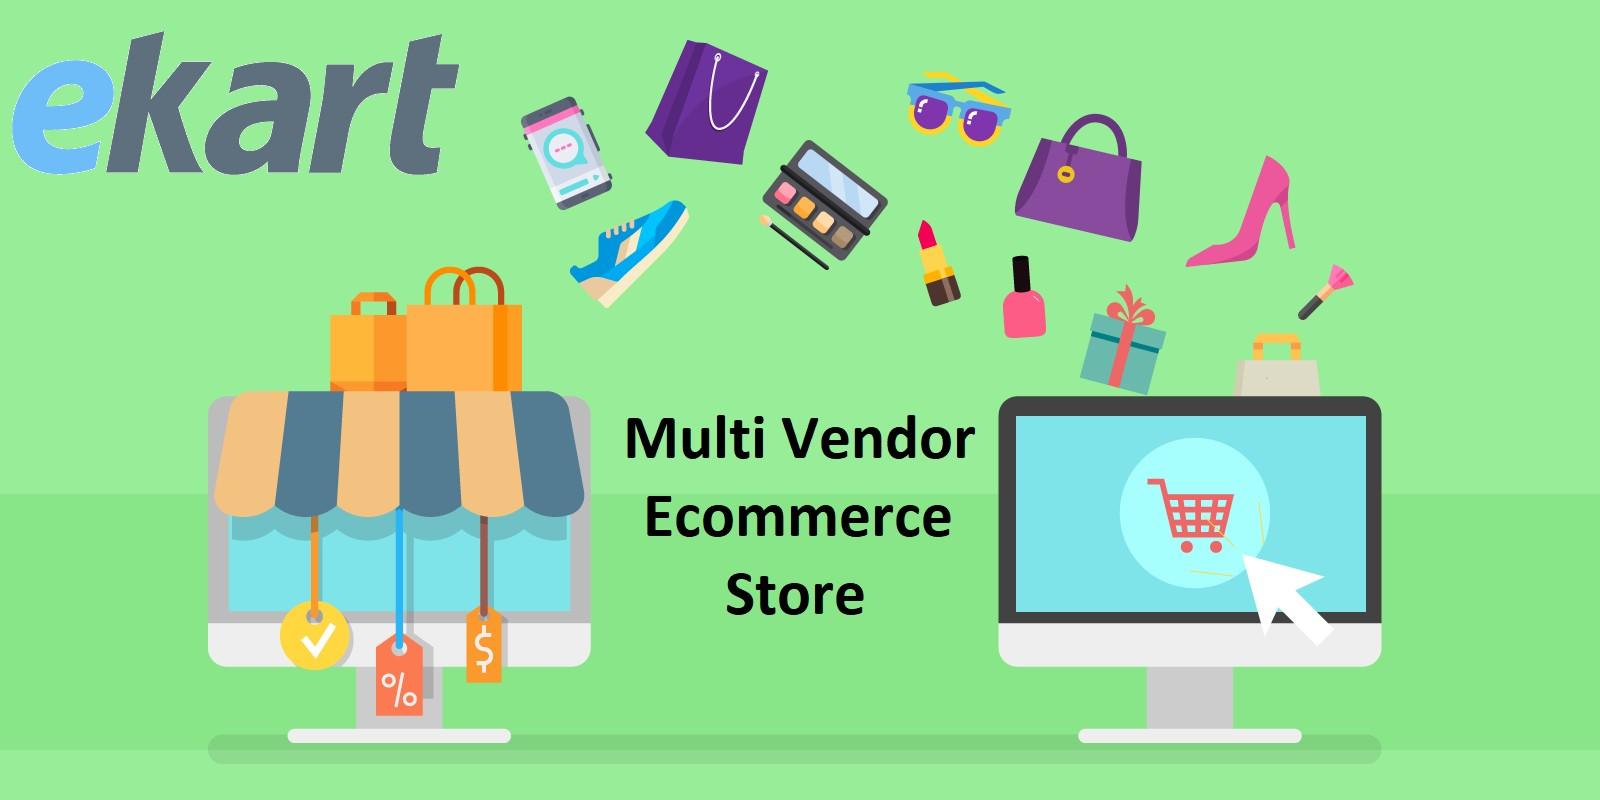 Ekart - Multi Vendor Ecommerce Store PHP